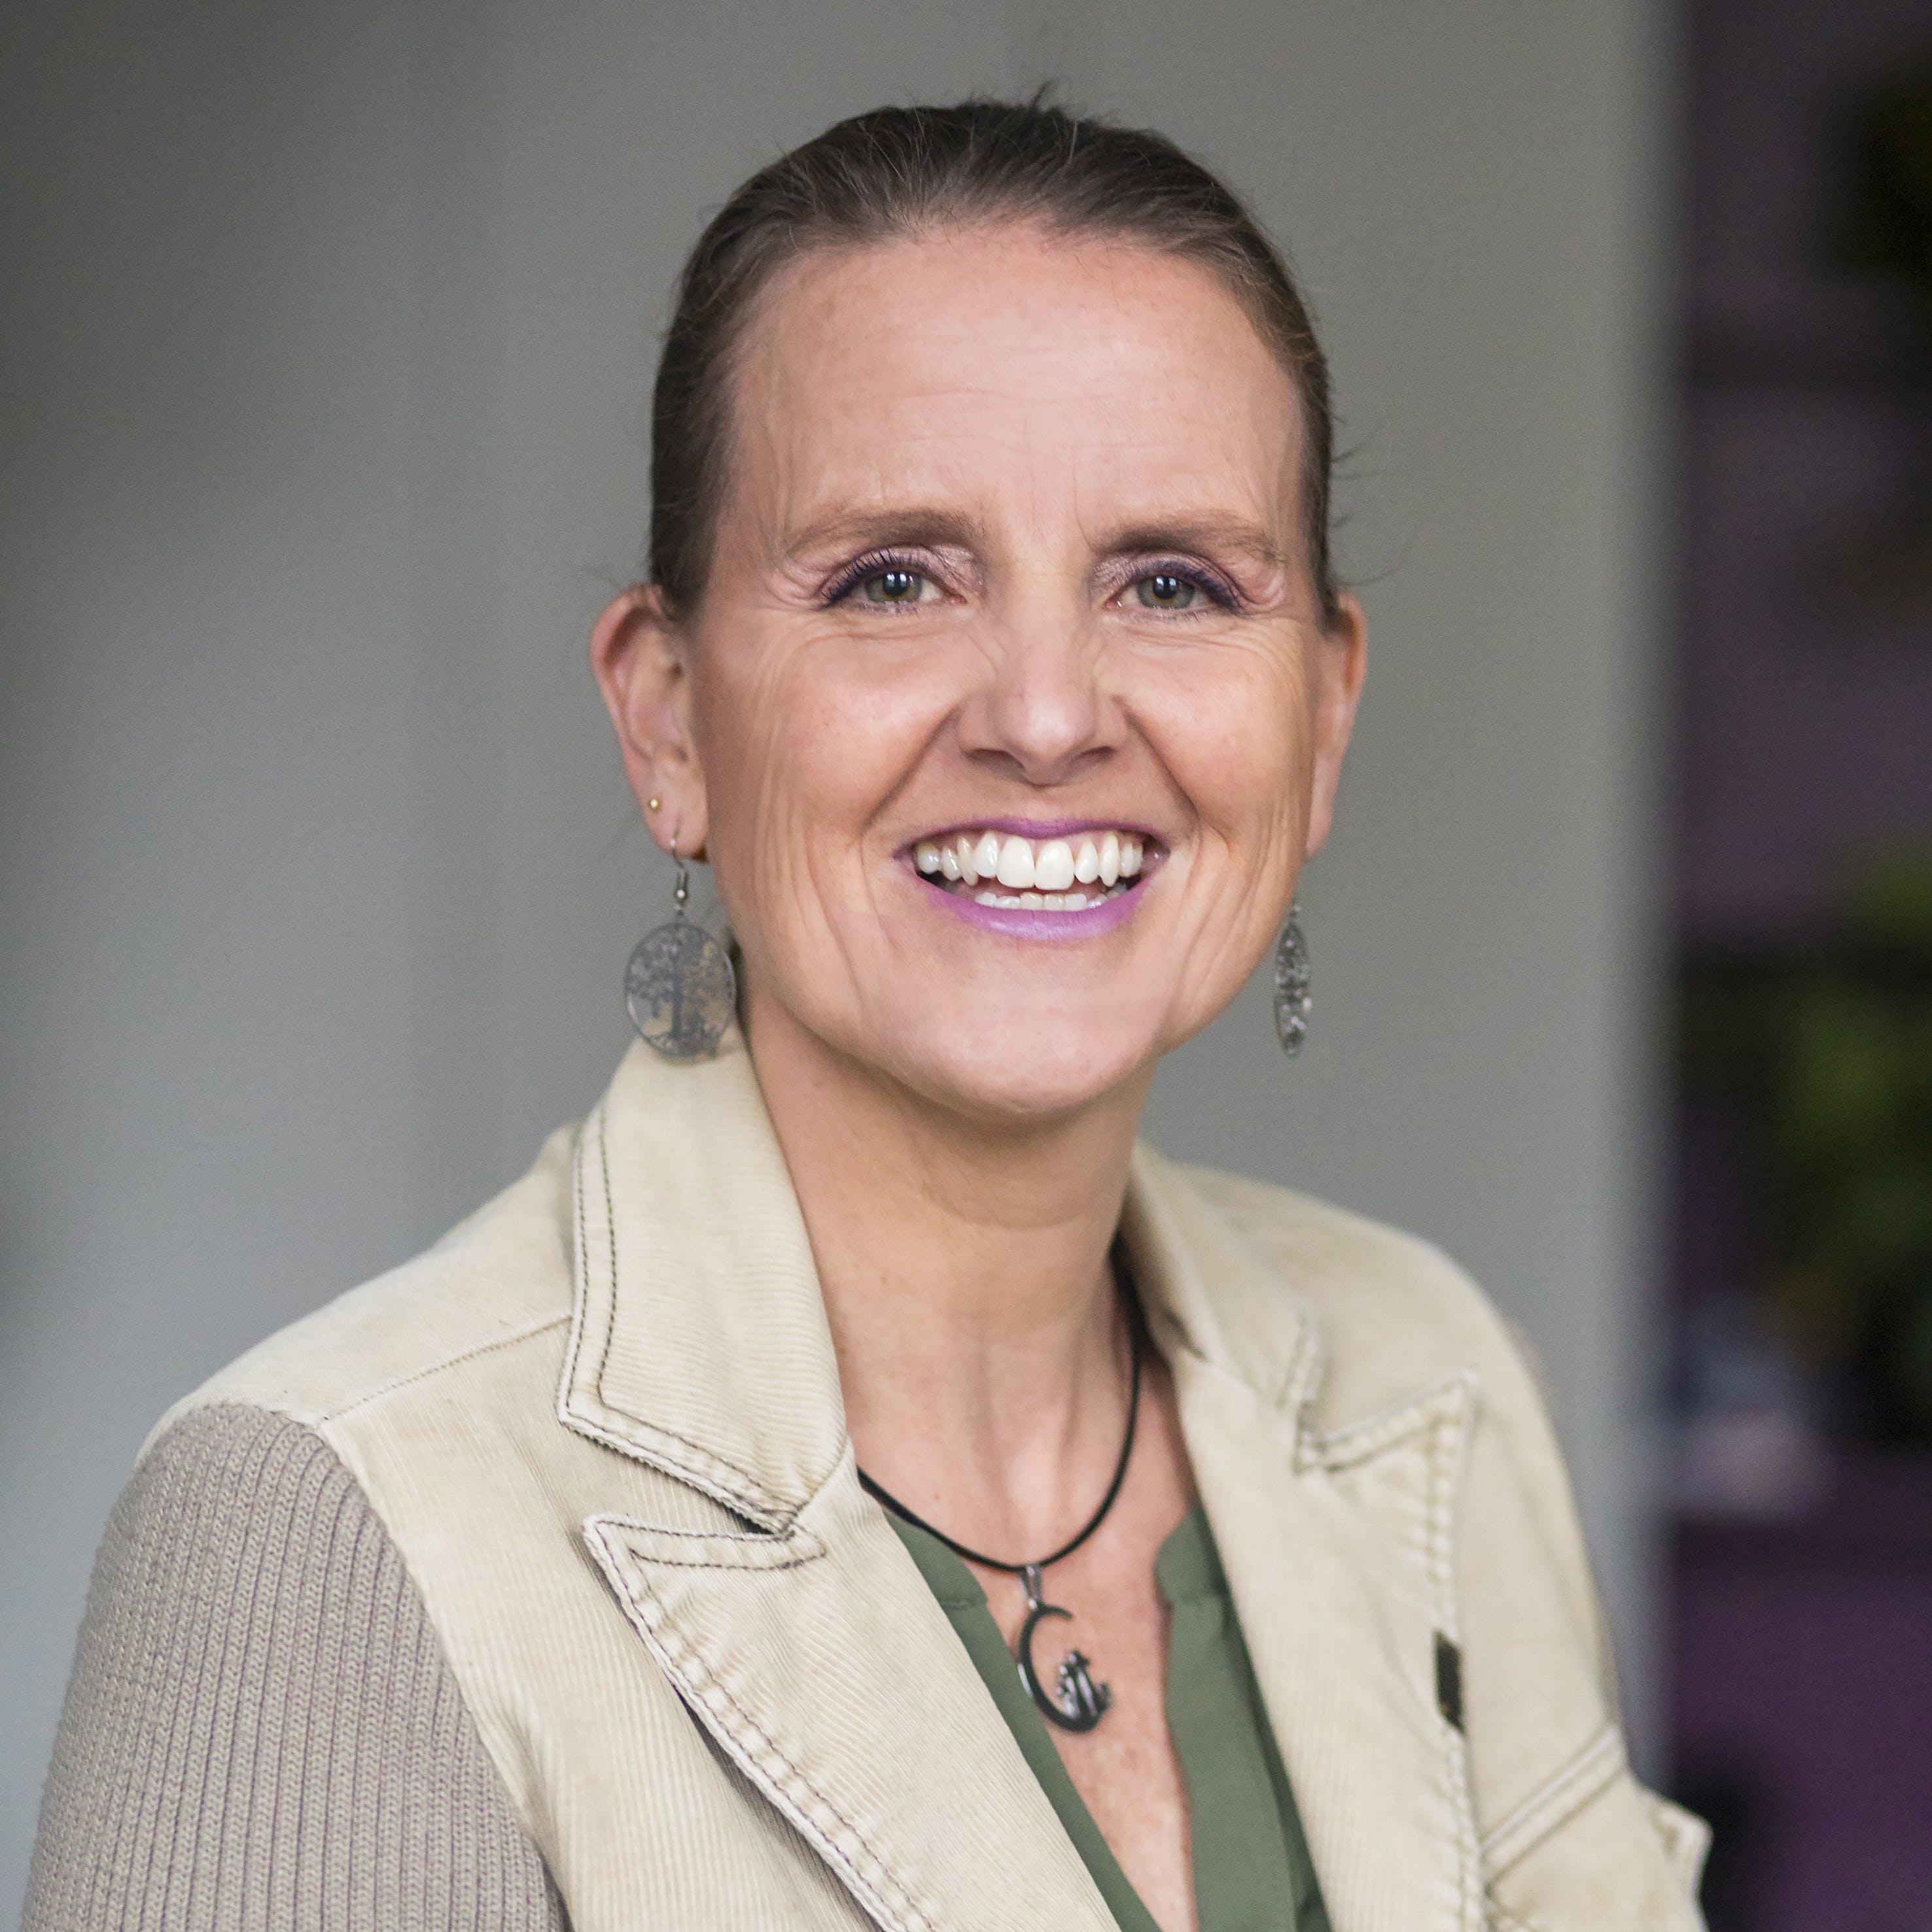 Sandra Heerspink